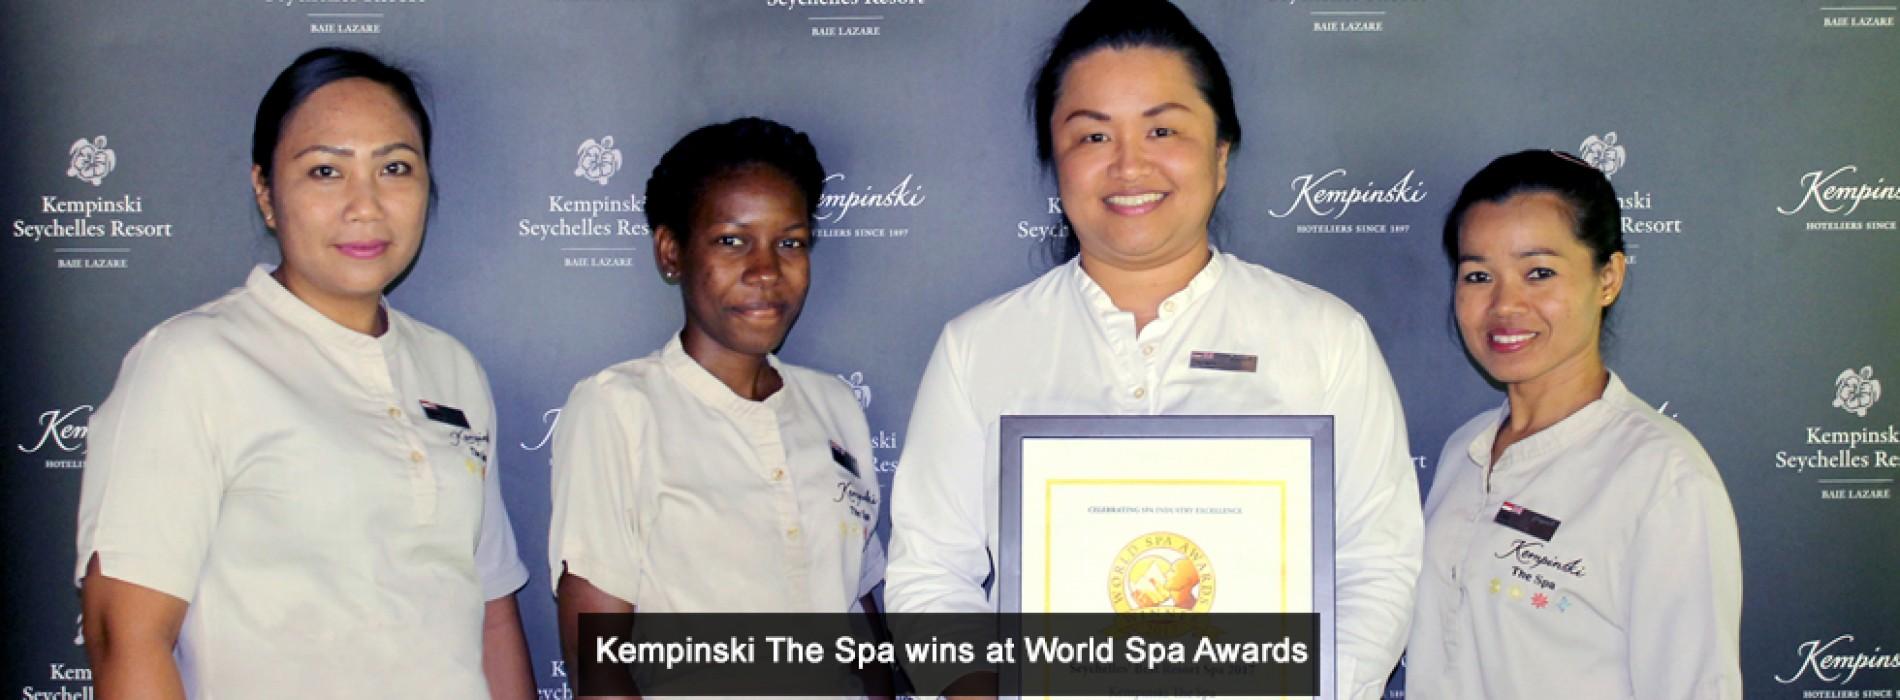 World Spa Awards 2017 winners revealed: 'Kempinski The Spa' named Seychelles' Best Resort Spa